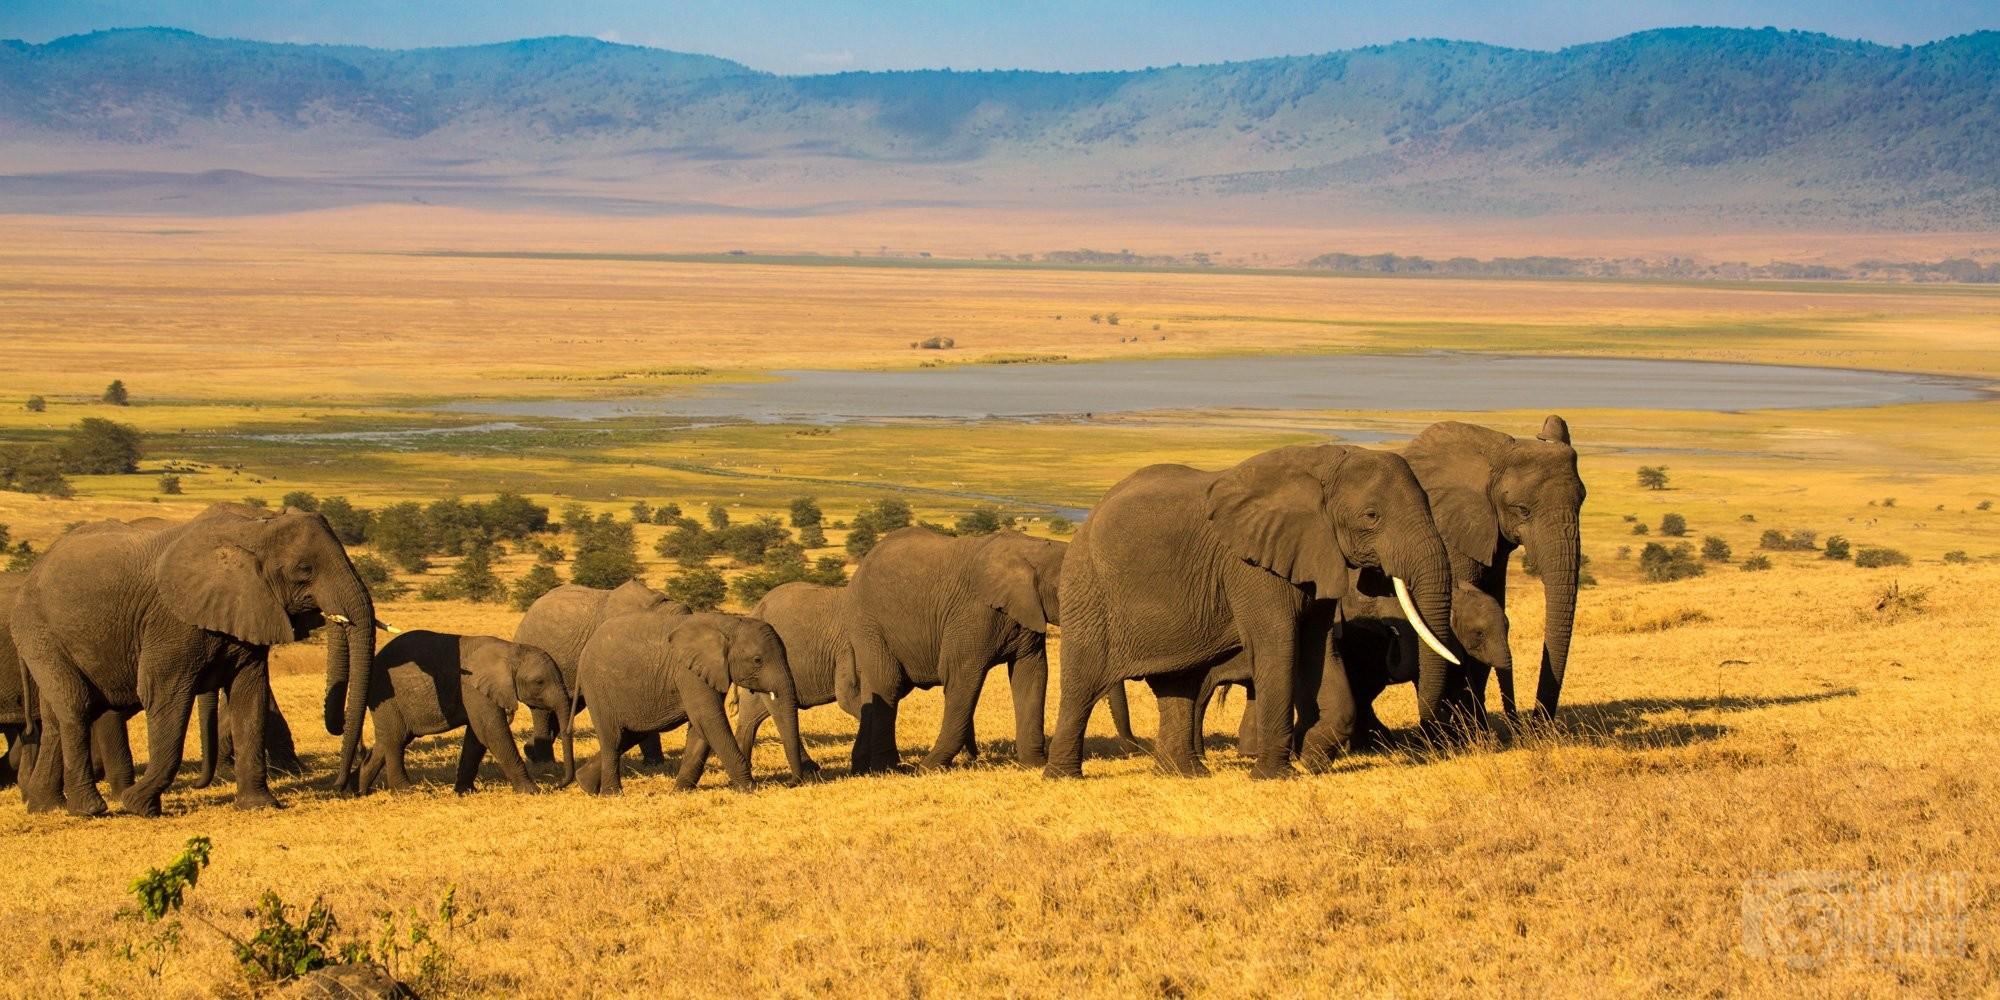 Elephant herd at sunset in Ngorongoro, Tanzania